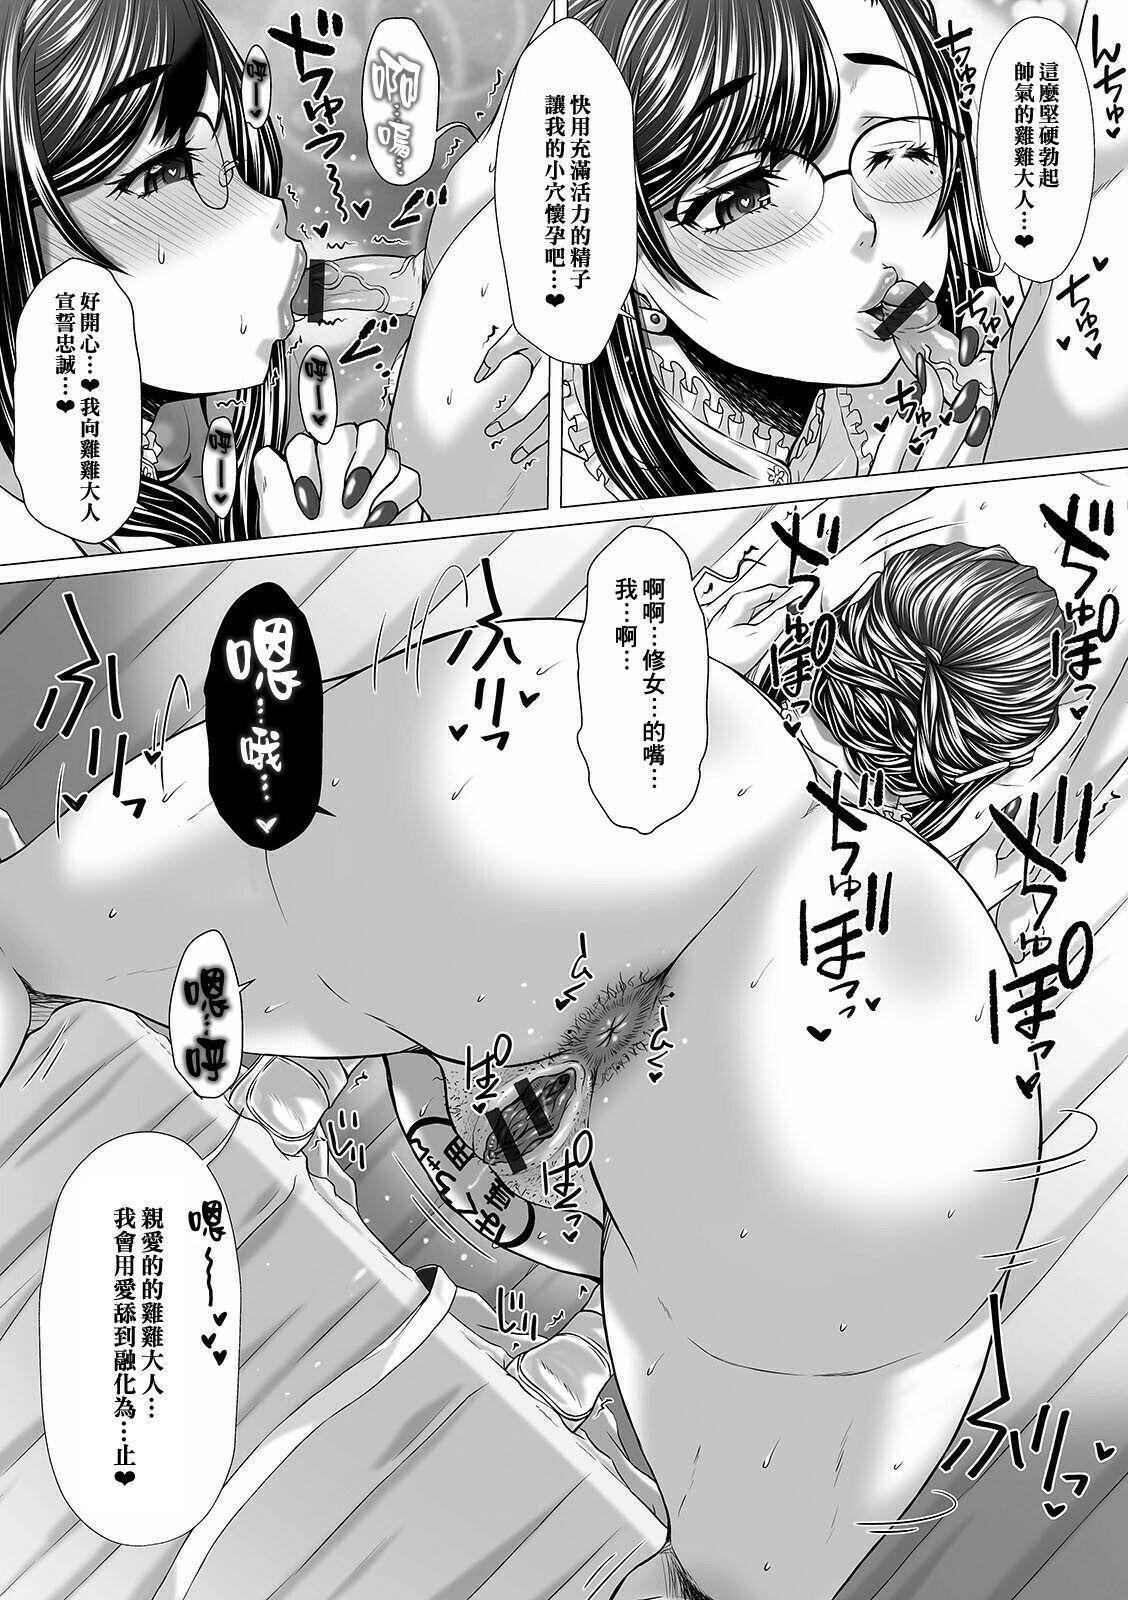 GOFUJYO Sister Chou 2 13